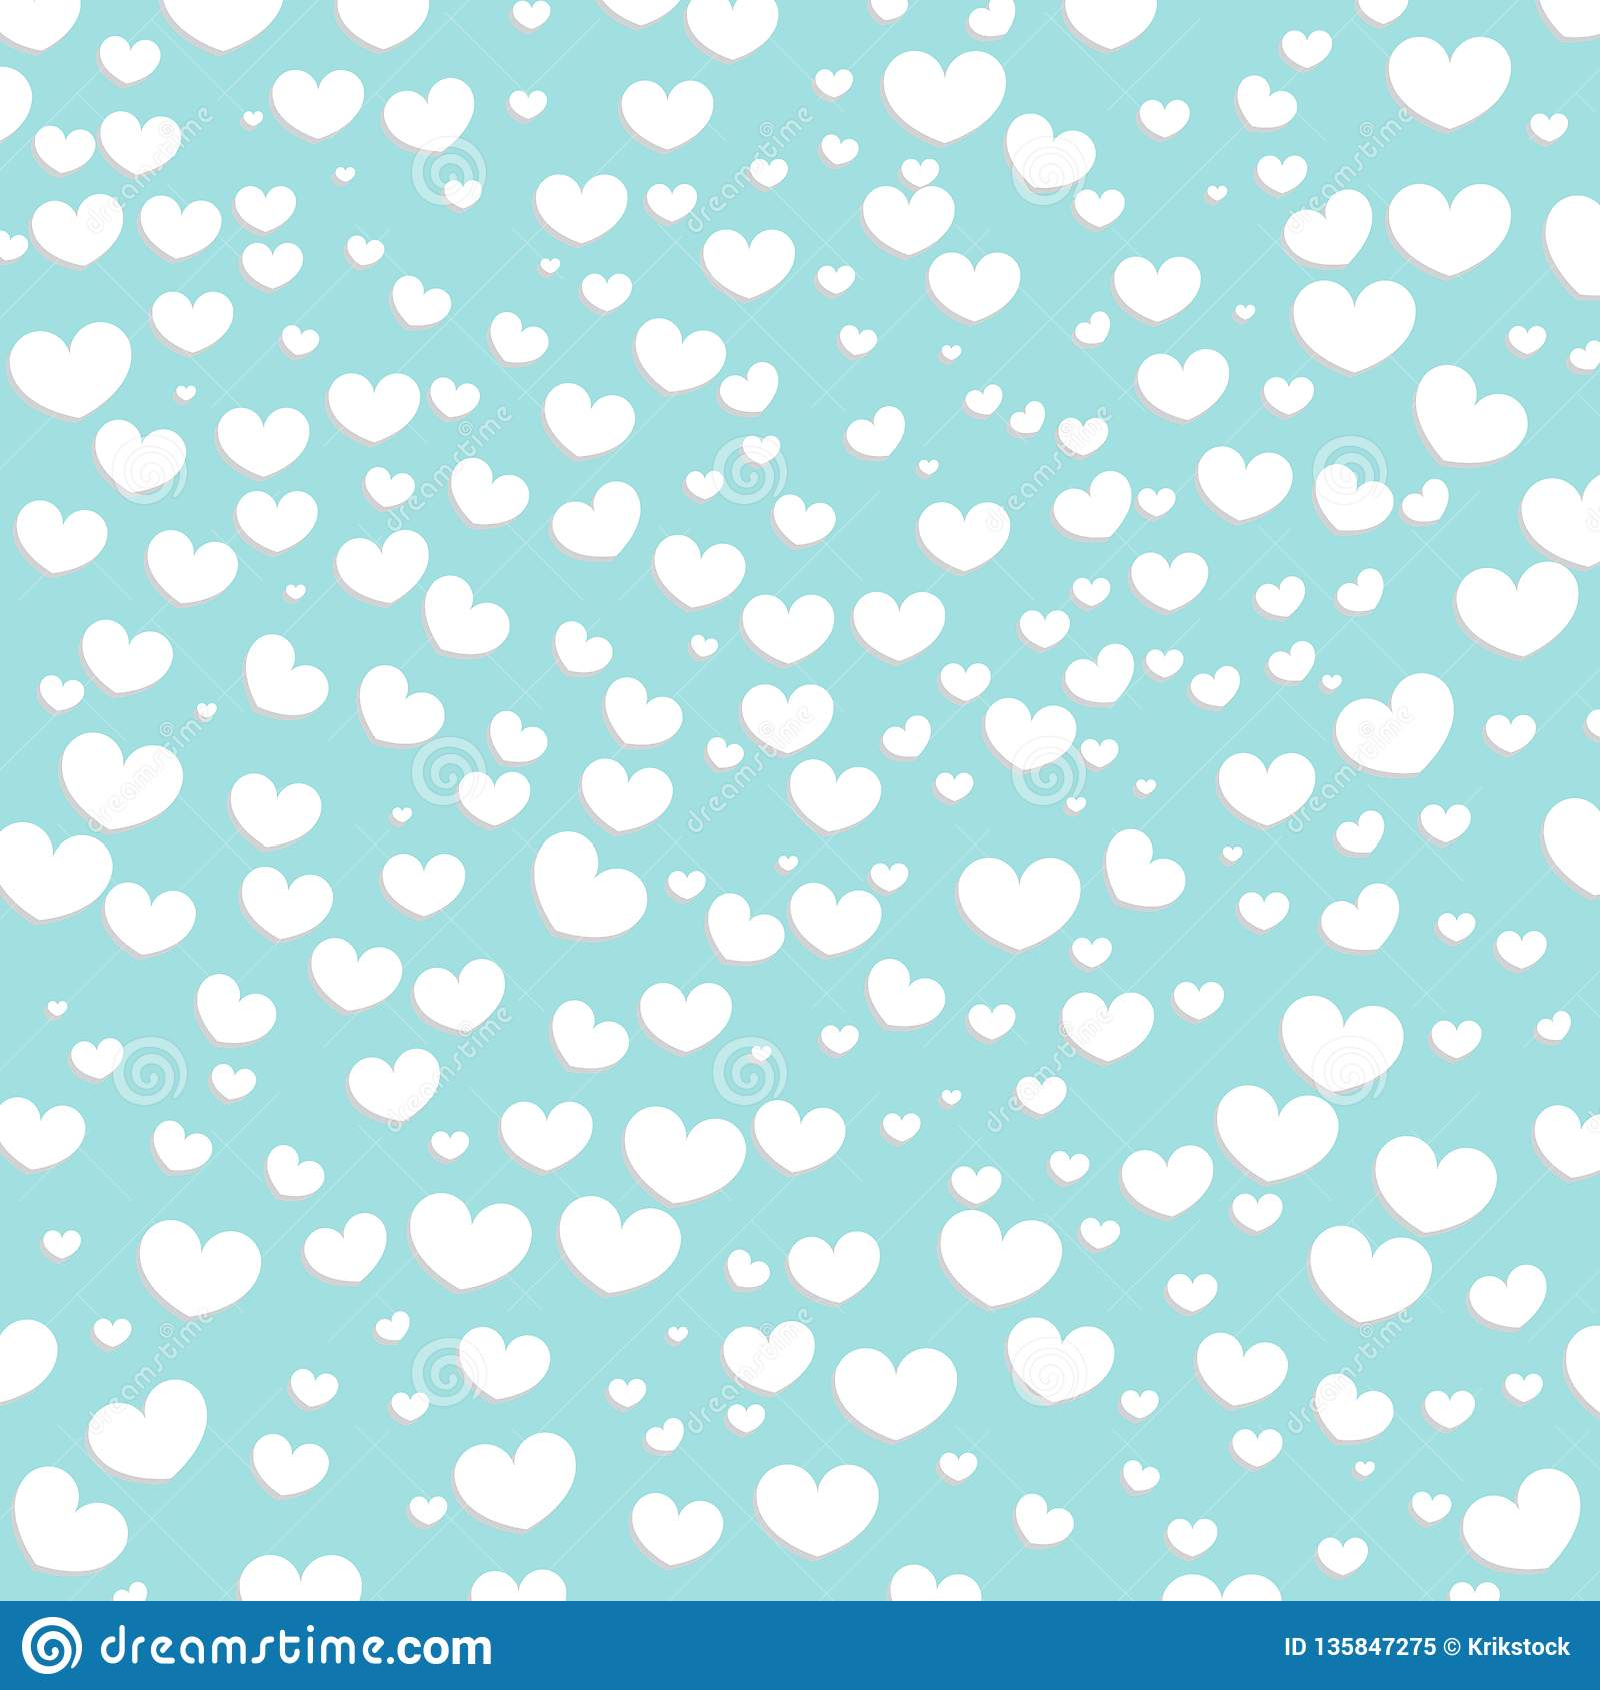 Hearts Design Background  Greeting Card Valentine Day